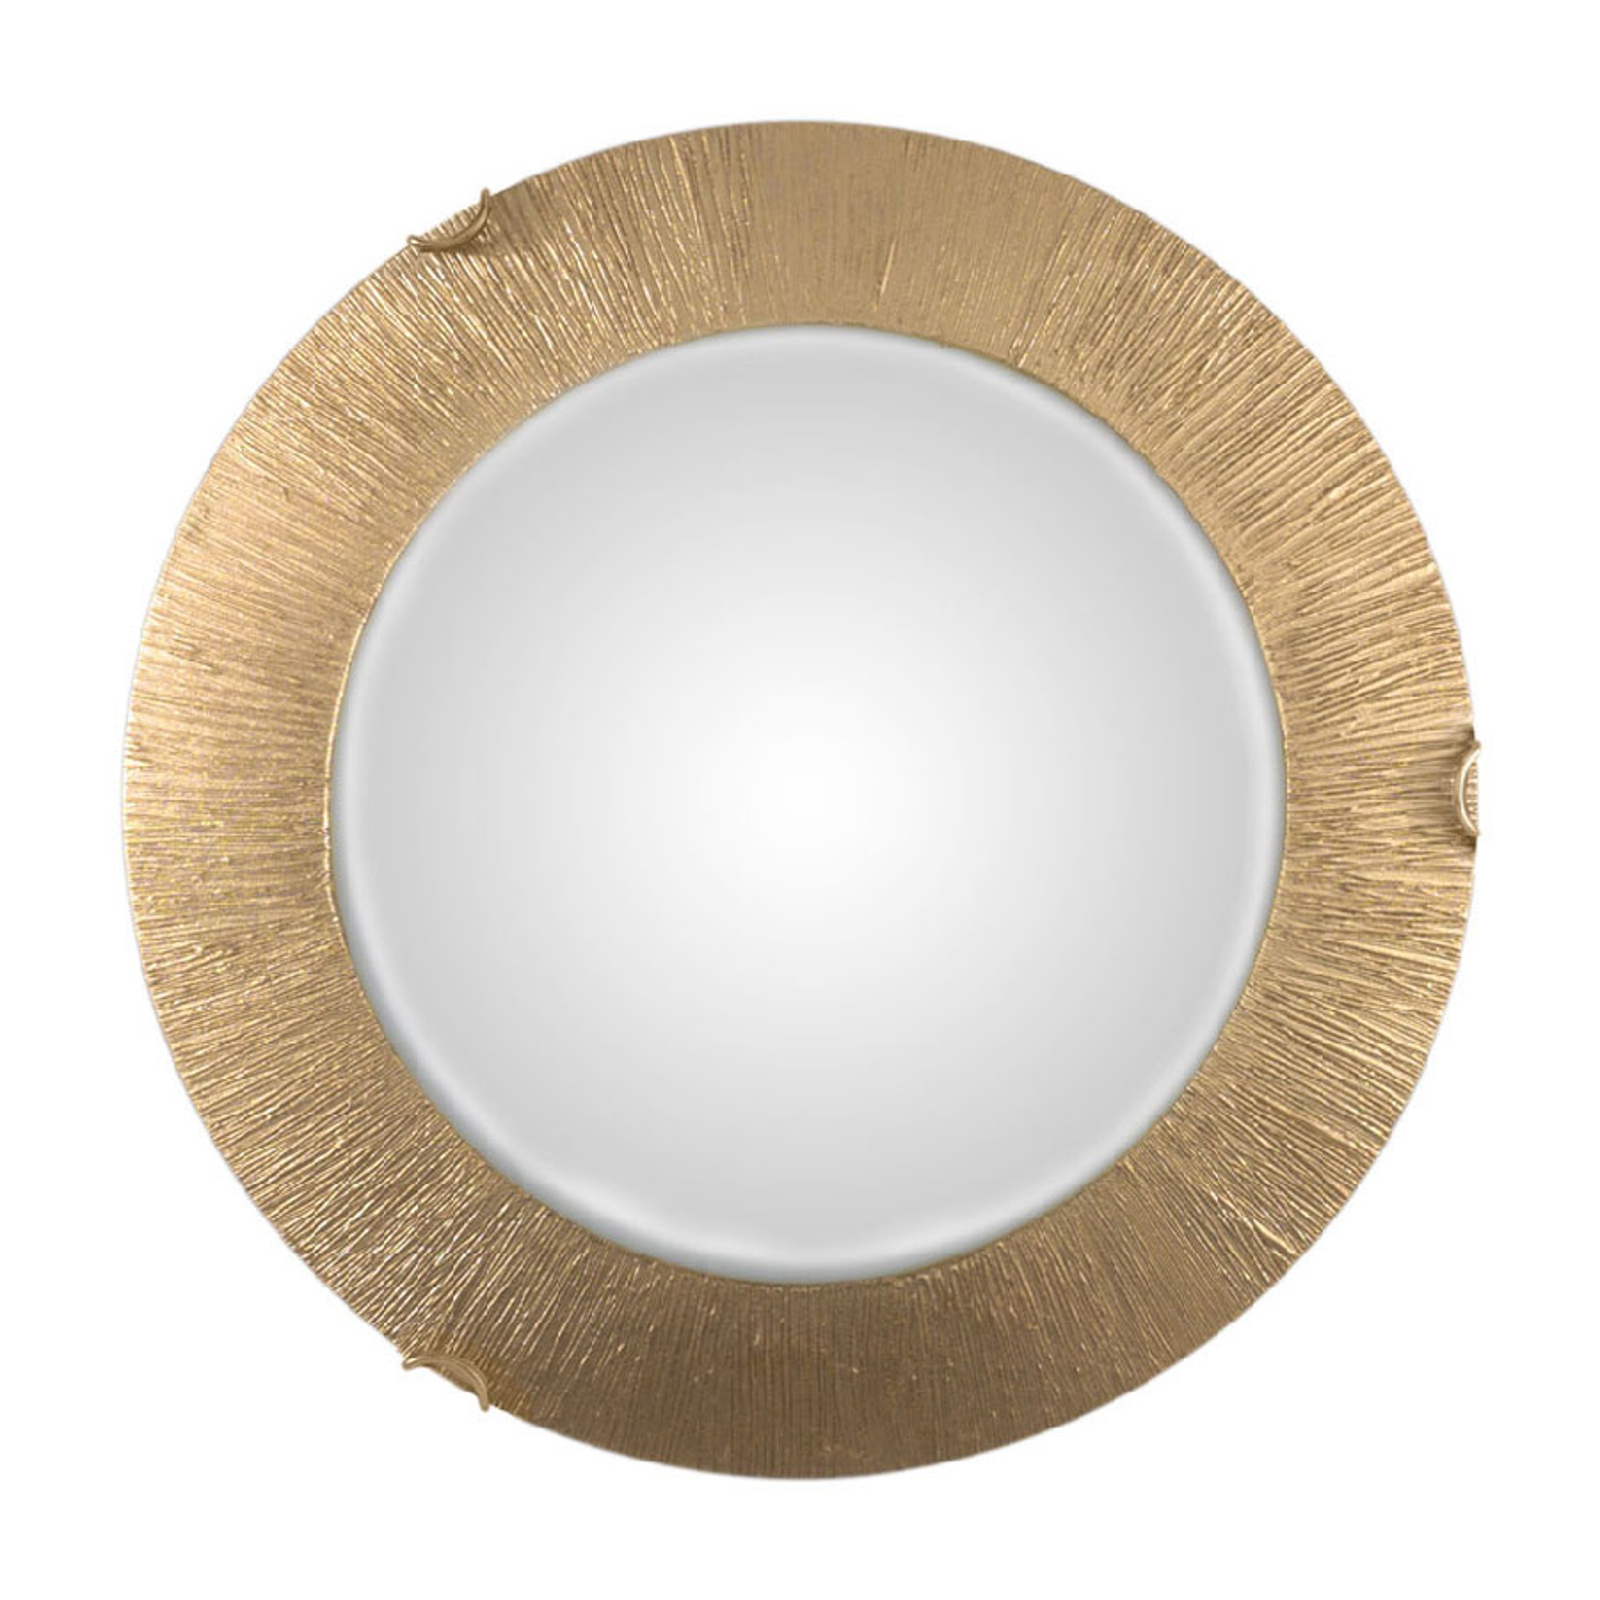 Deckenlampe Moon Sun, gold, Ø 40 cm